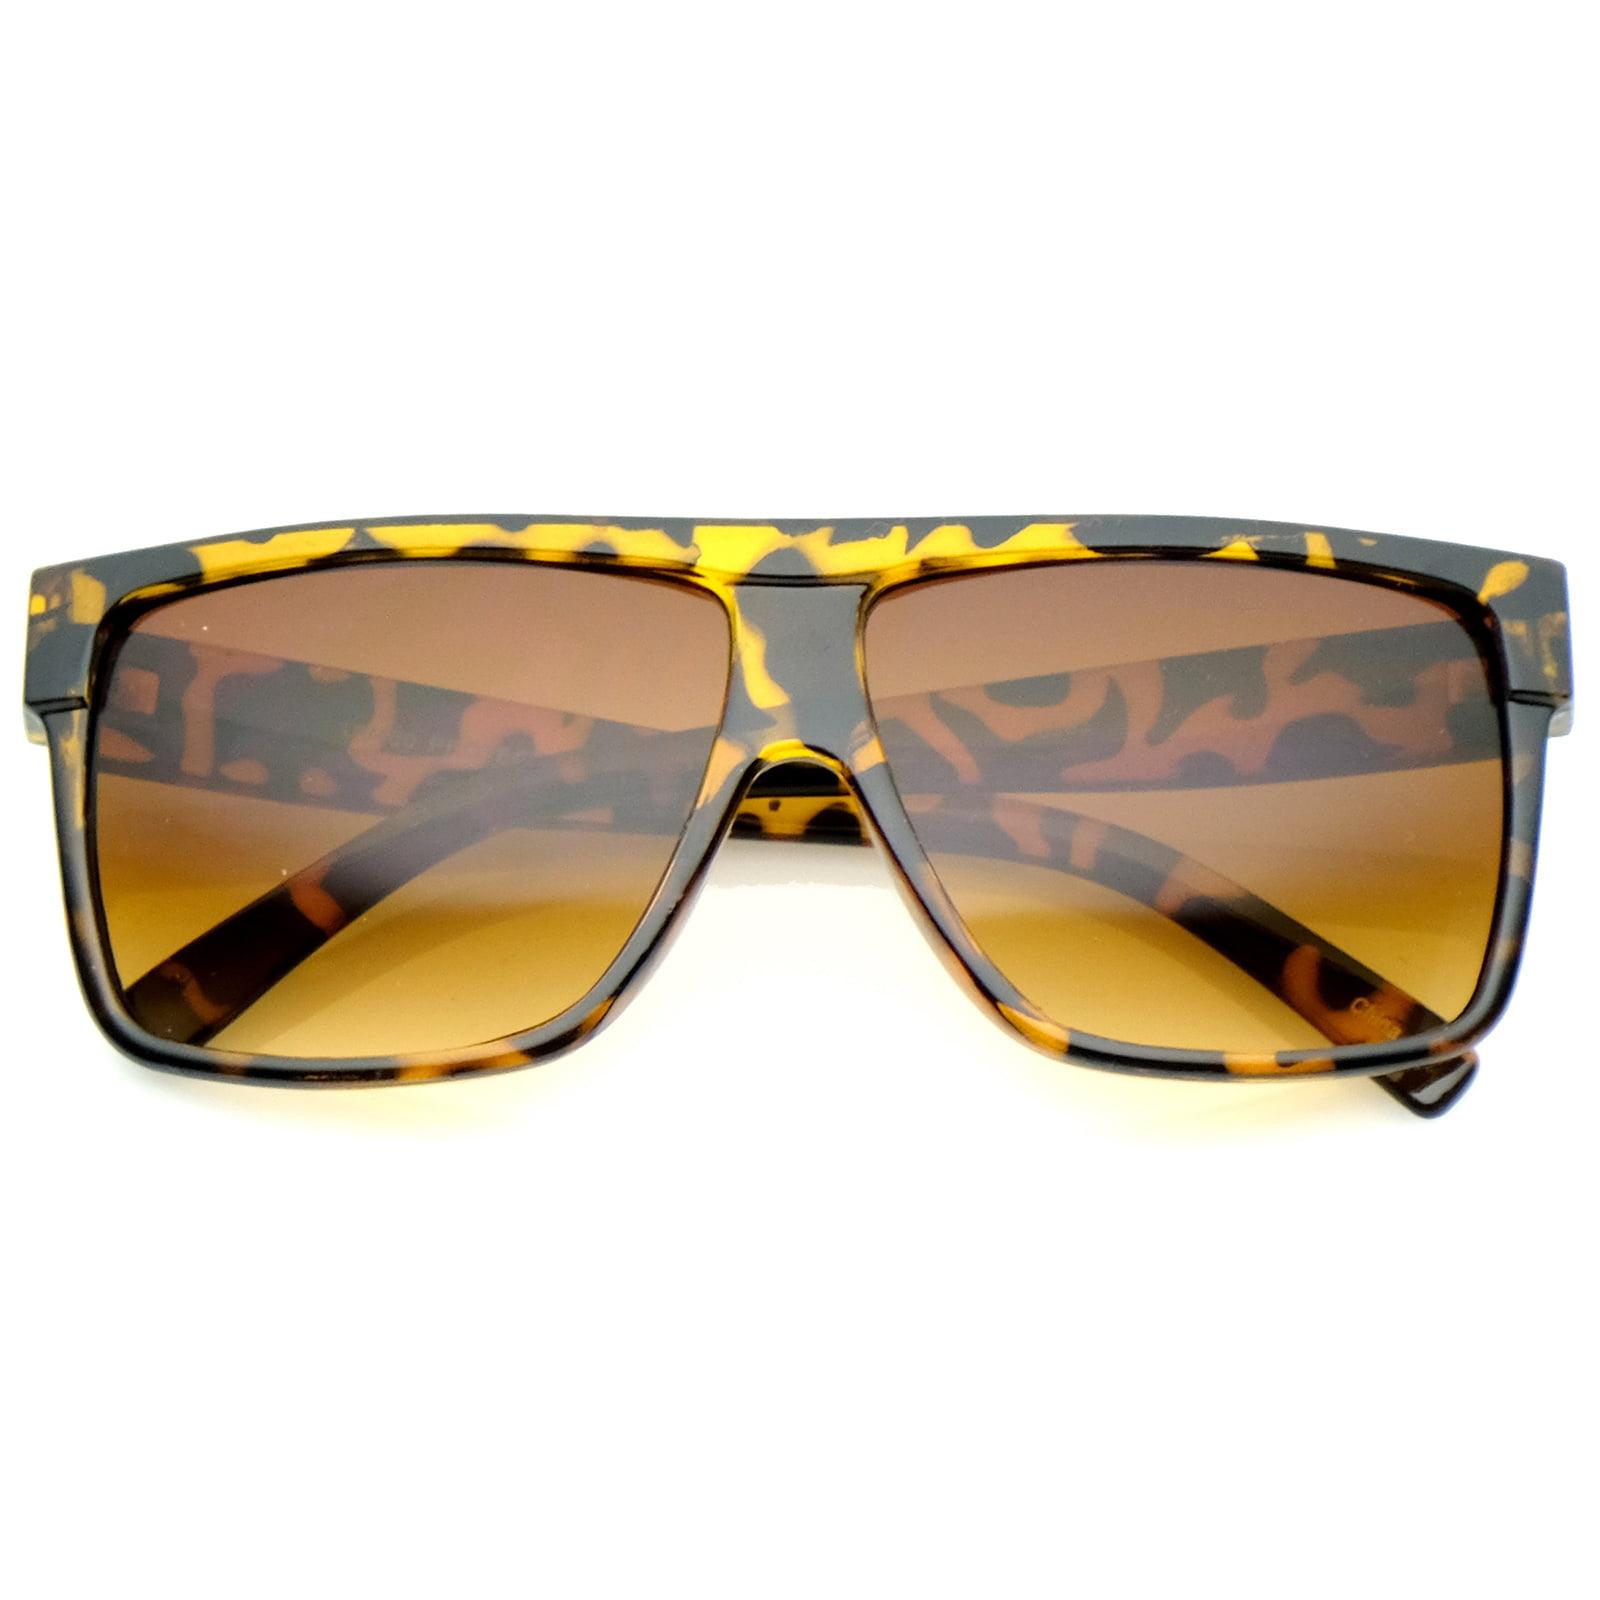 sunglassLA - Oversize Flat Top Wide Temples Square Aviator Sunglasses 61mm - 61mm